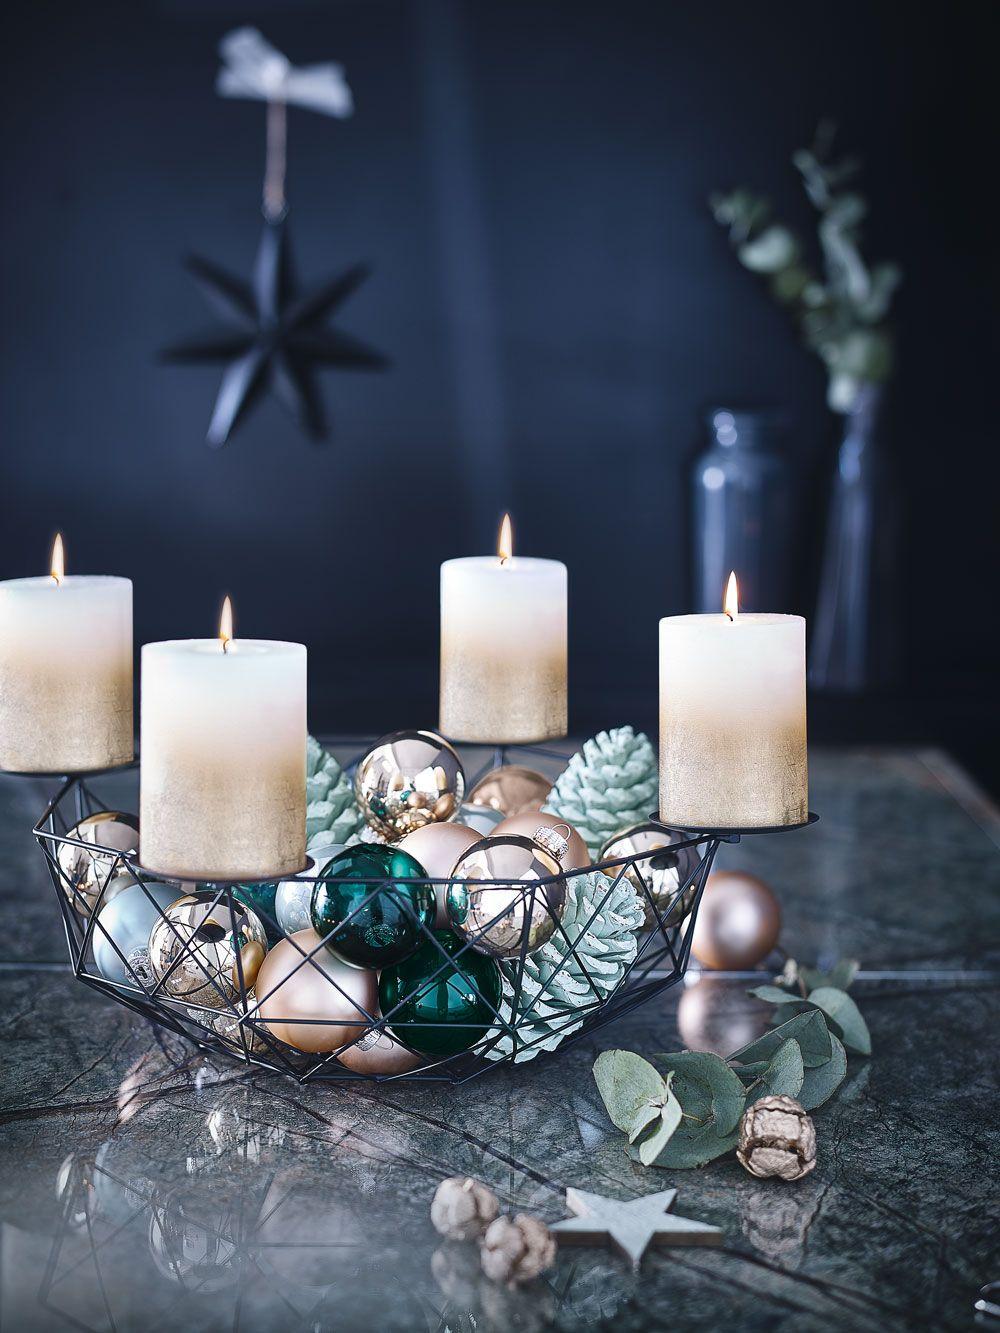 adventskranze bei depot europ ische weihnachtstraditionen. Black Bedroom Furniture Sets. Home Design Ideas